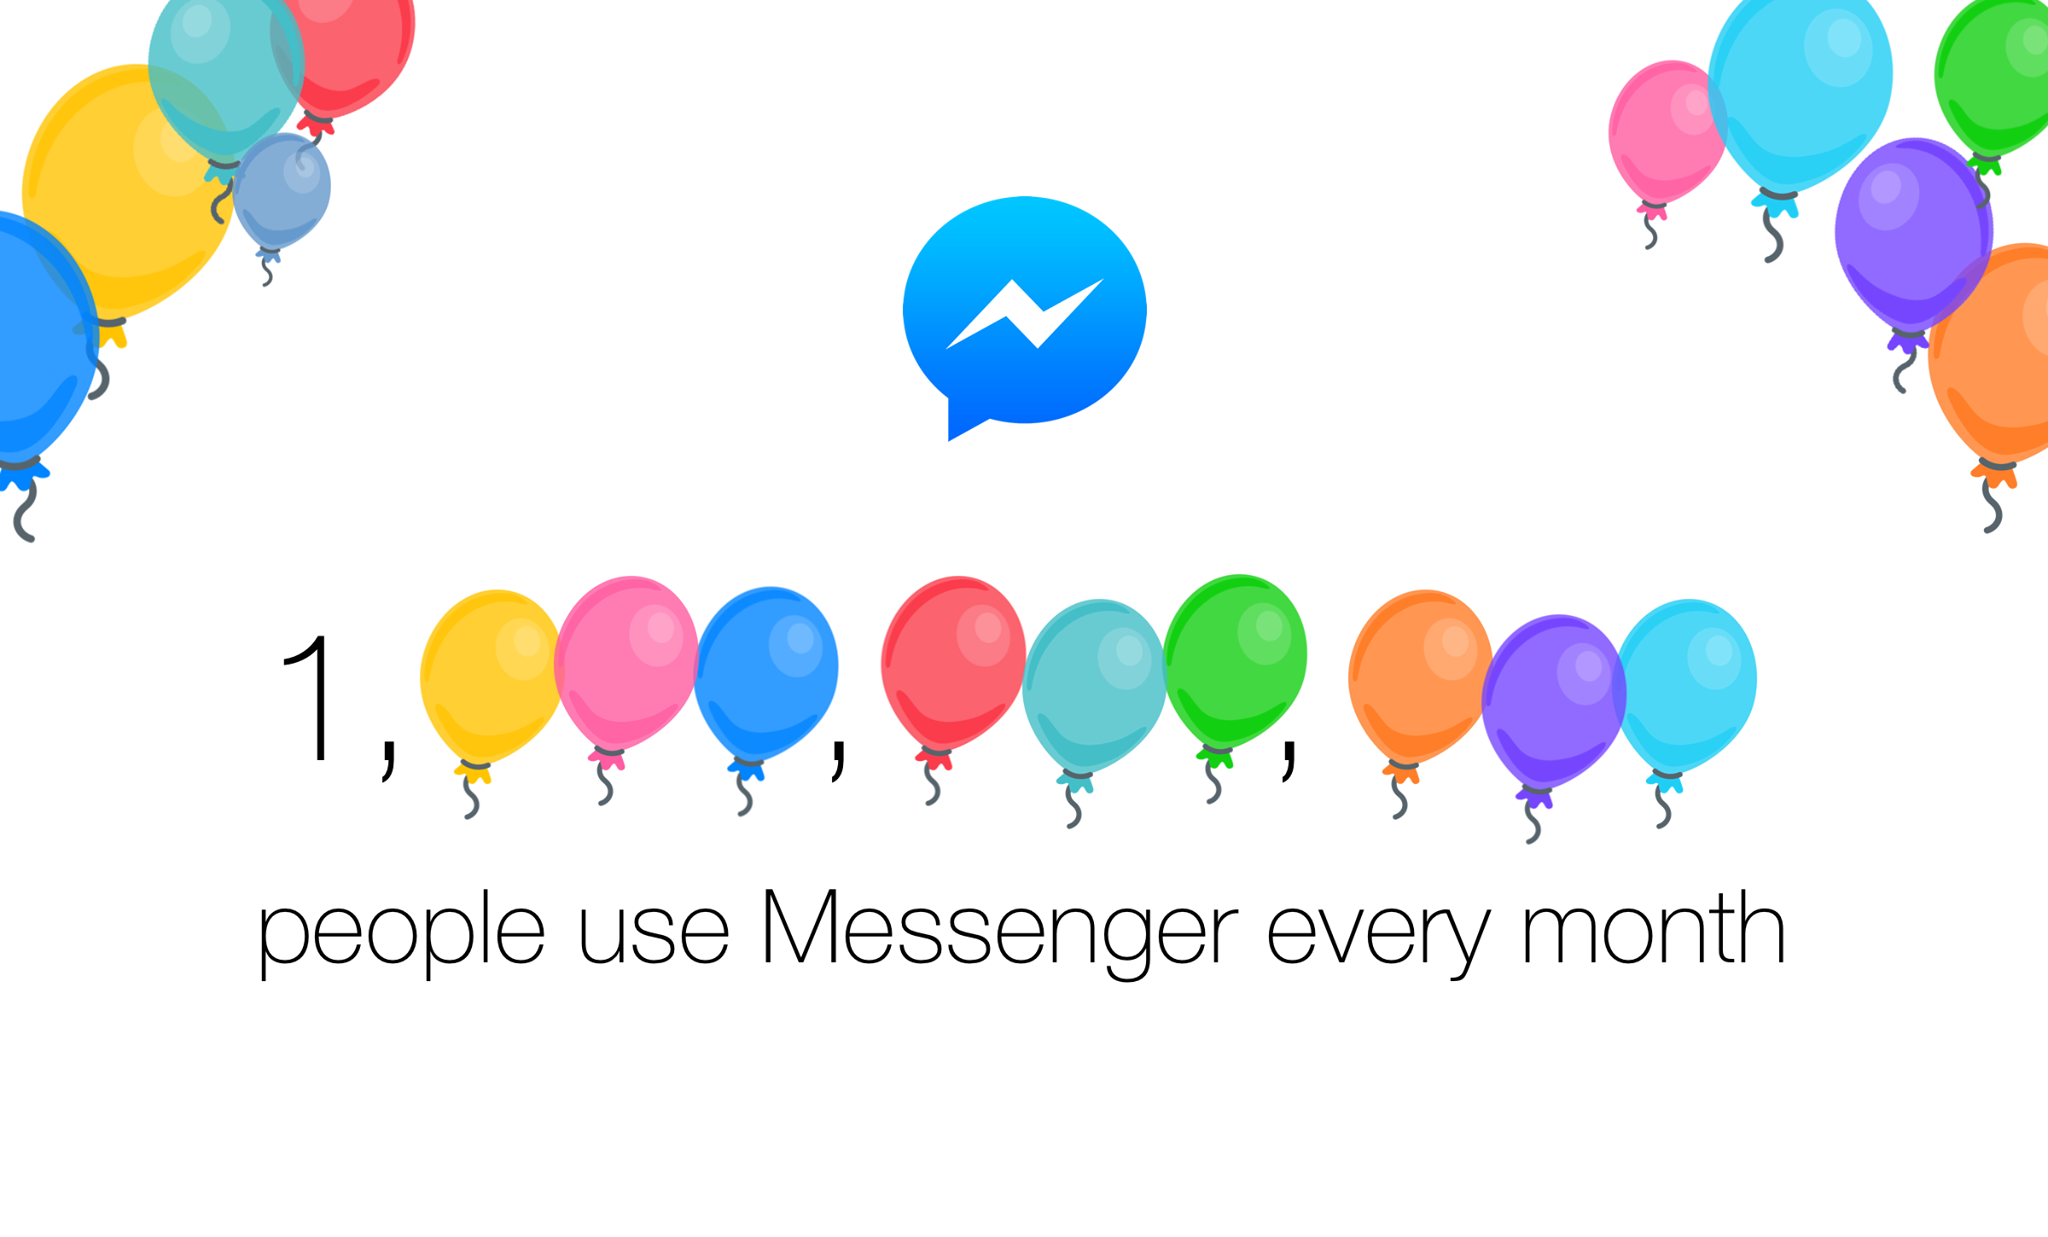 facebook 1 milliard Facebook Messenger compte plus d1 milliard dutilisateurs actifs !